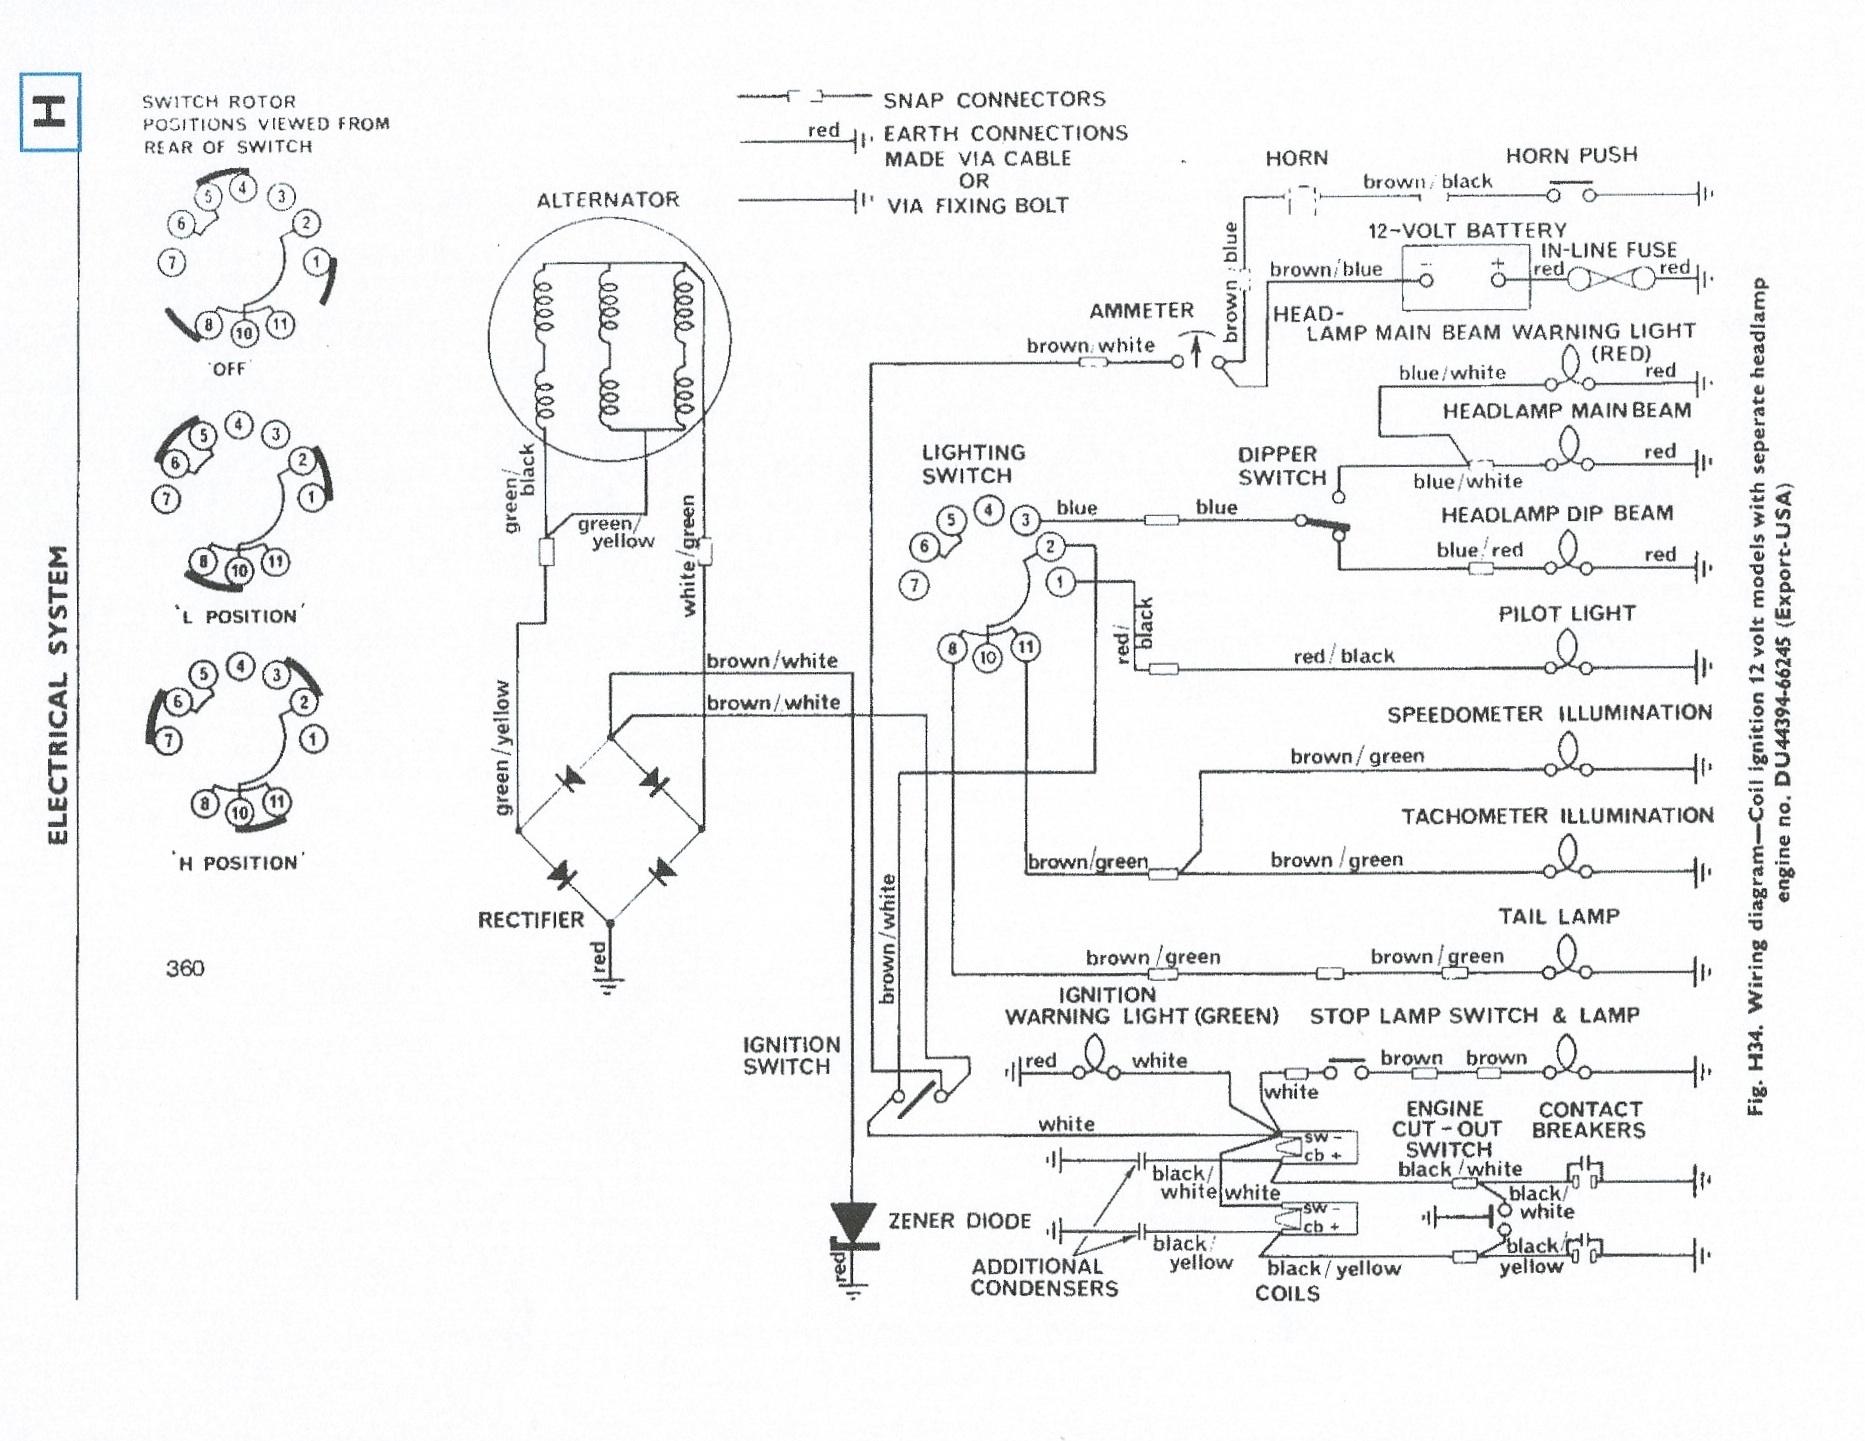 1976 Triumph Tr6 Wiringdiagram Related Keywords Suggestions Wiring Diagram For Tr7 76